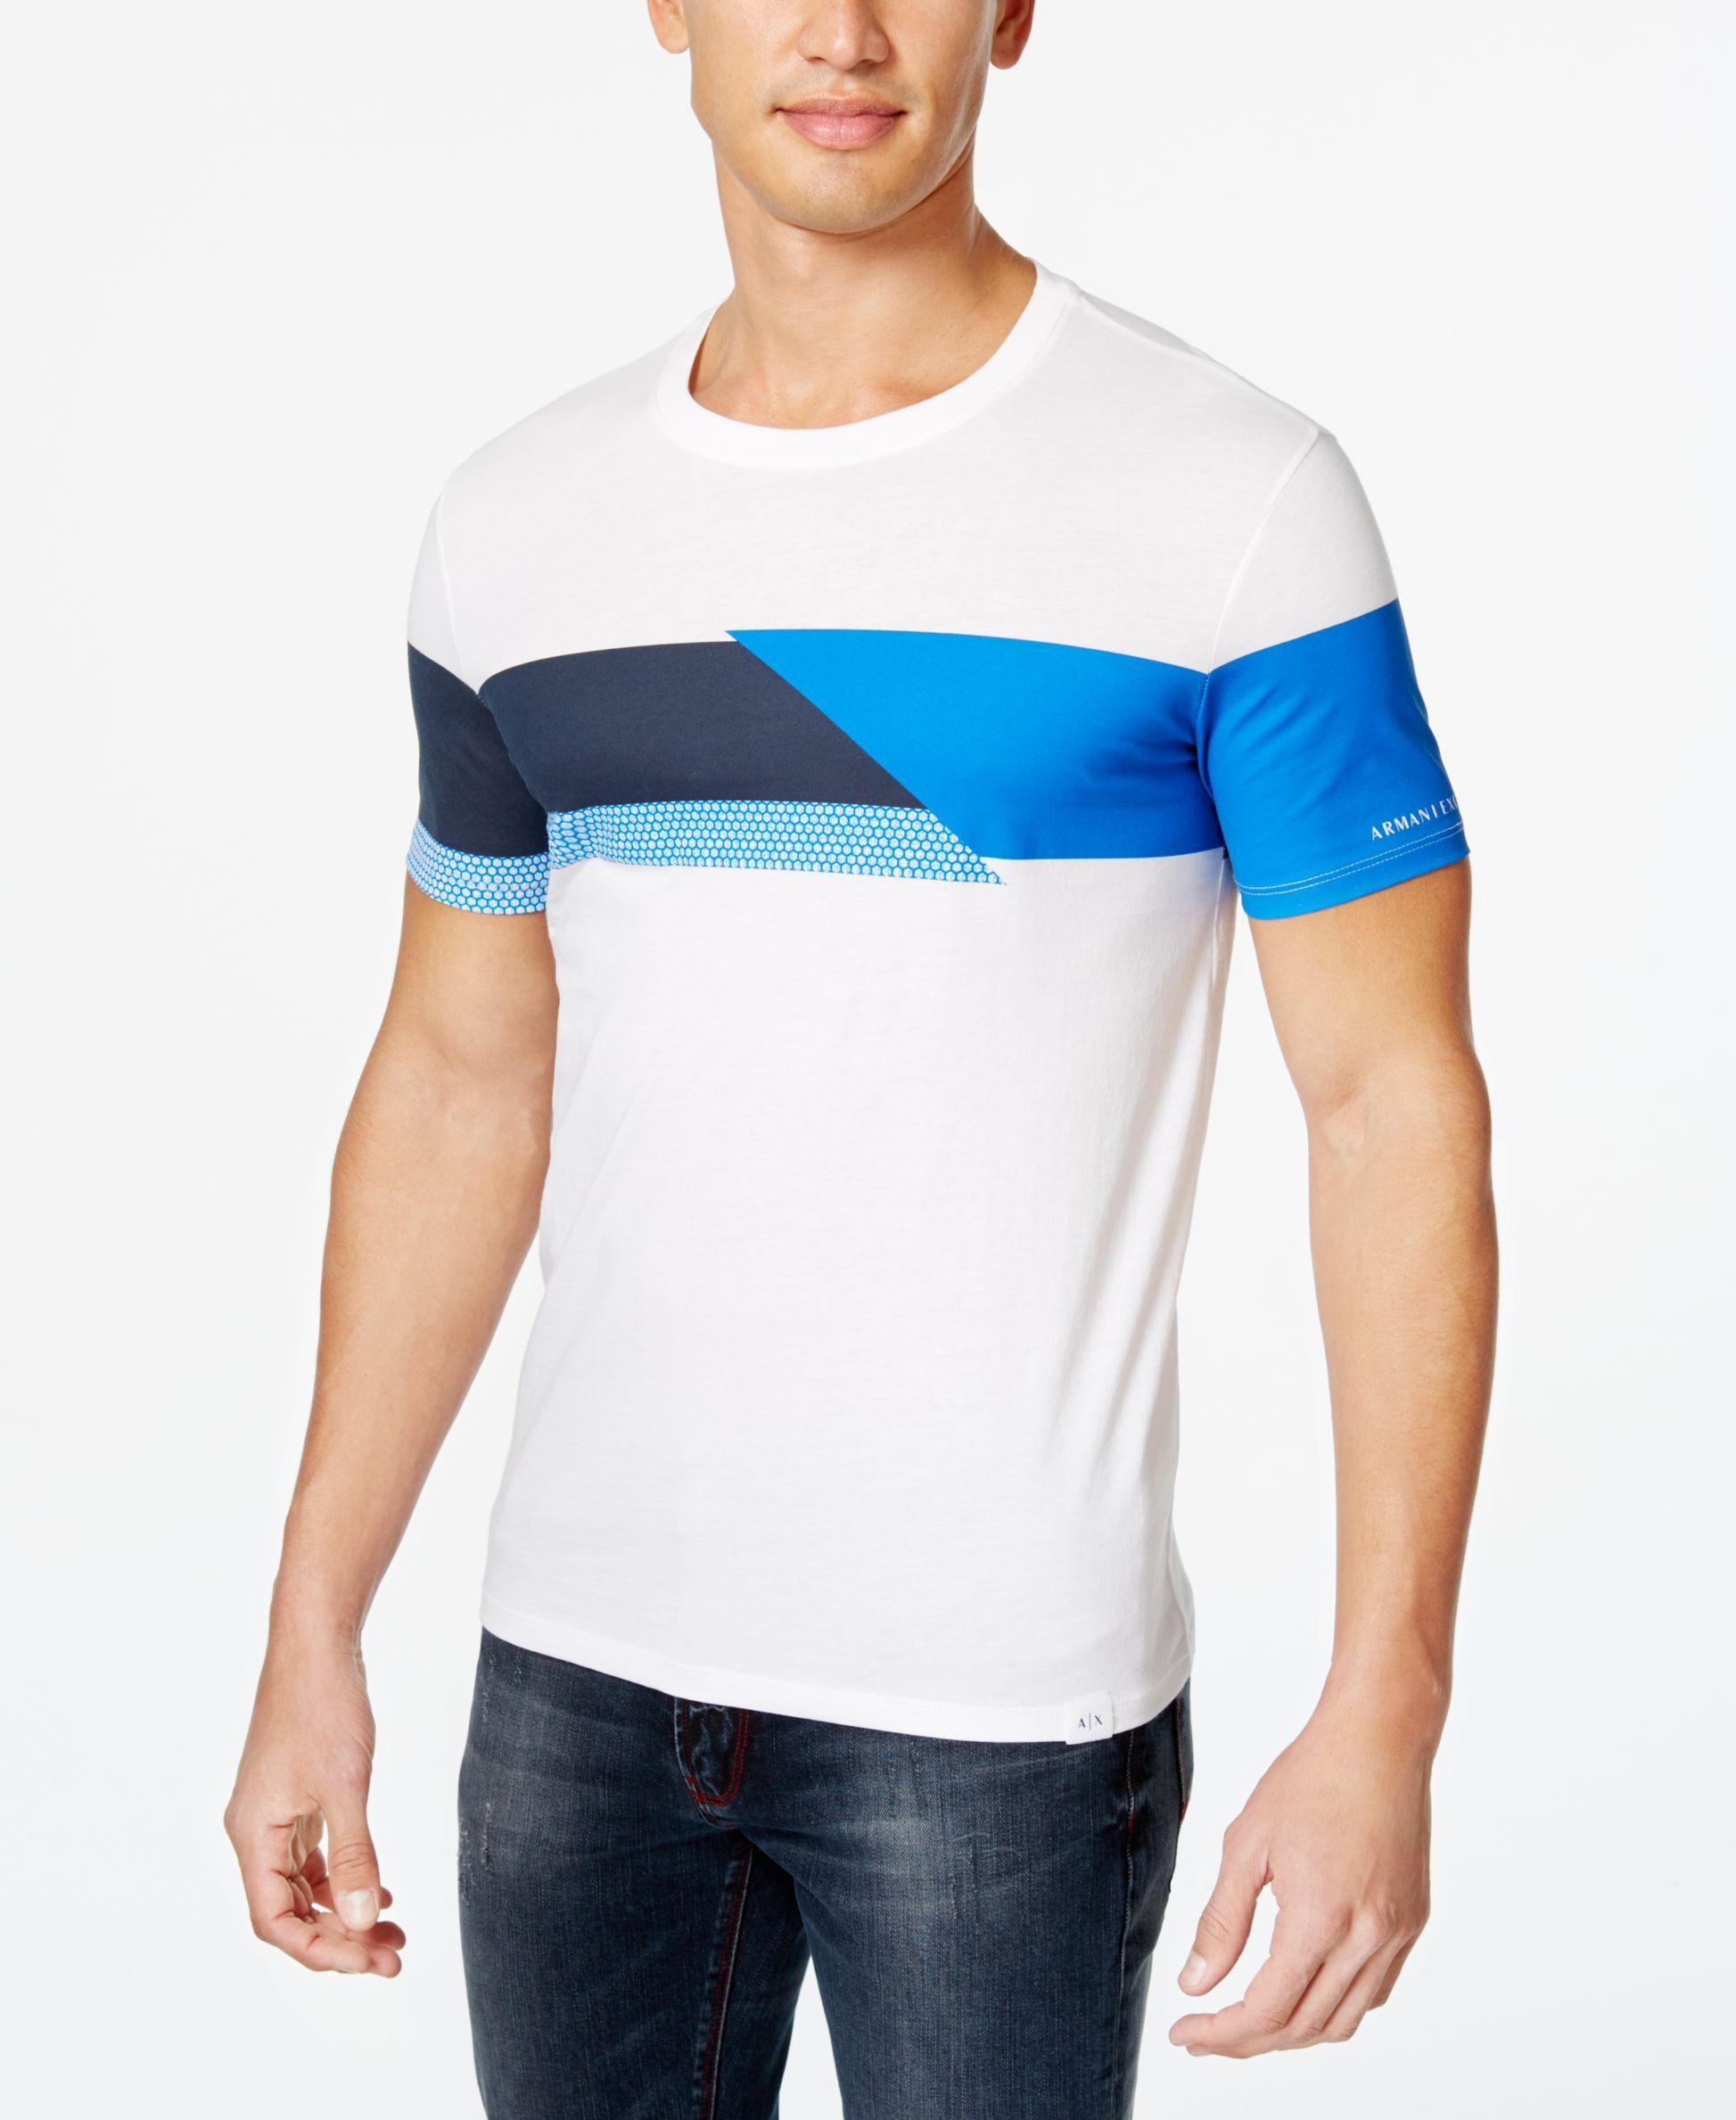 It Armani Print ShirtClothes Exchange Men's T All Across Graphic 80wXNnOkPZ